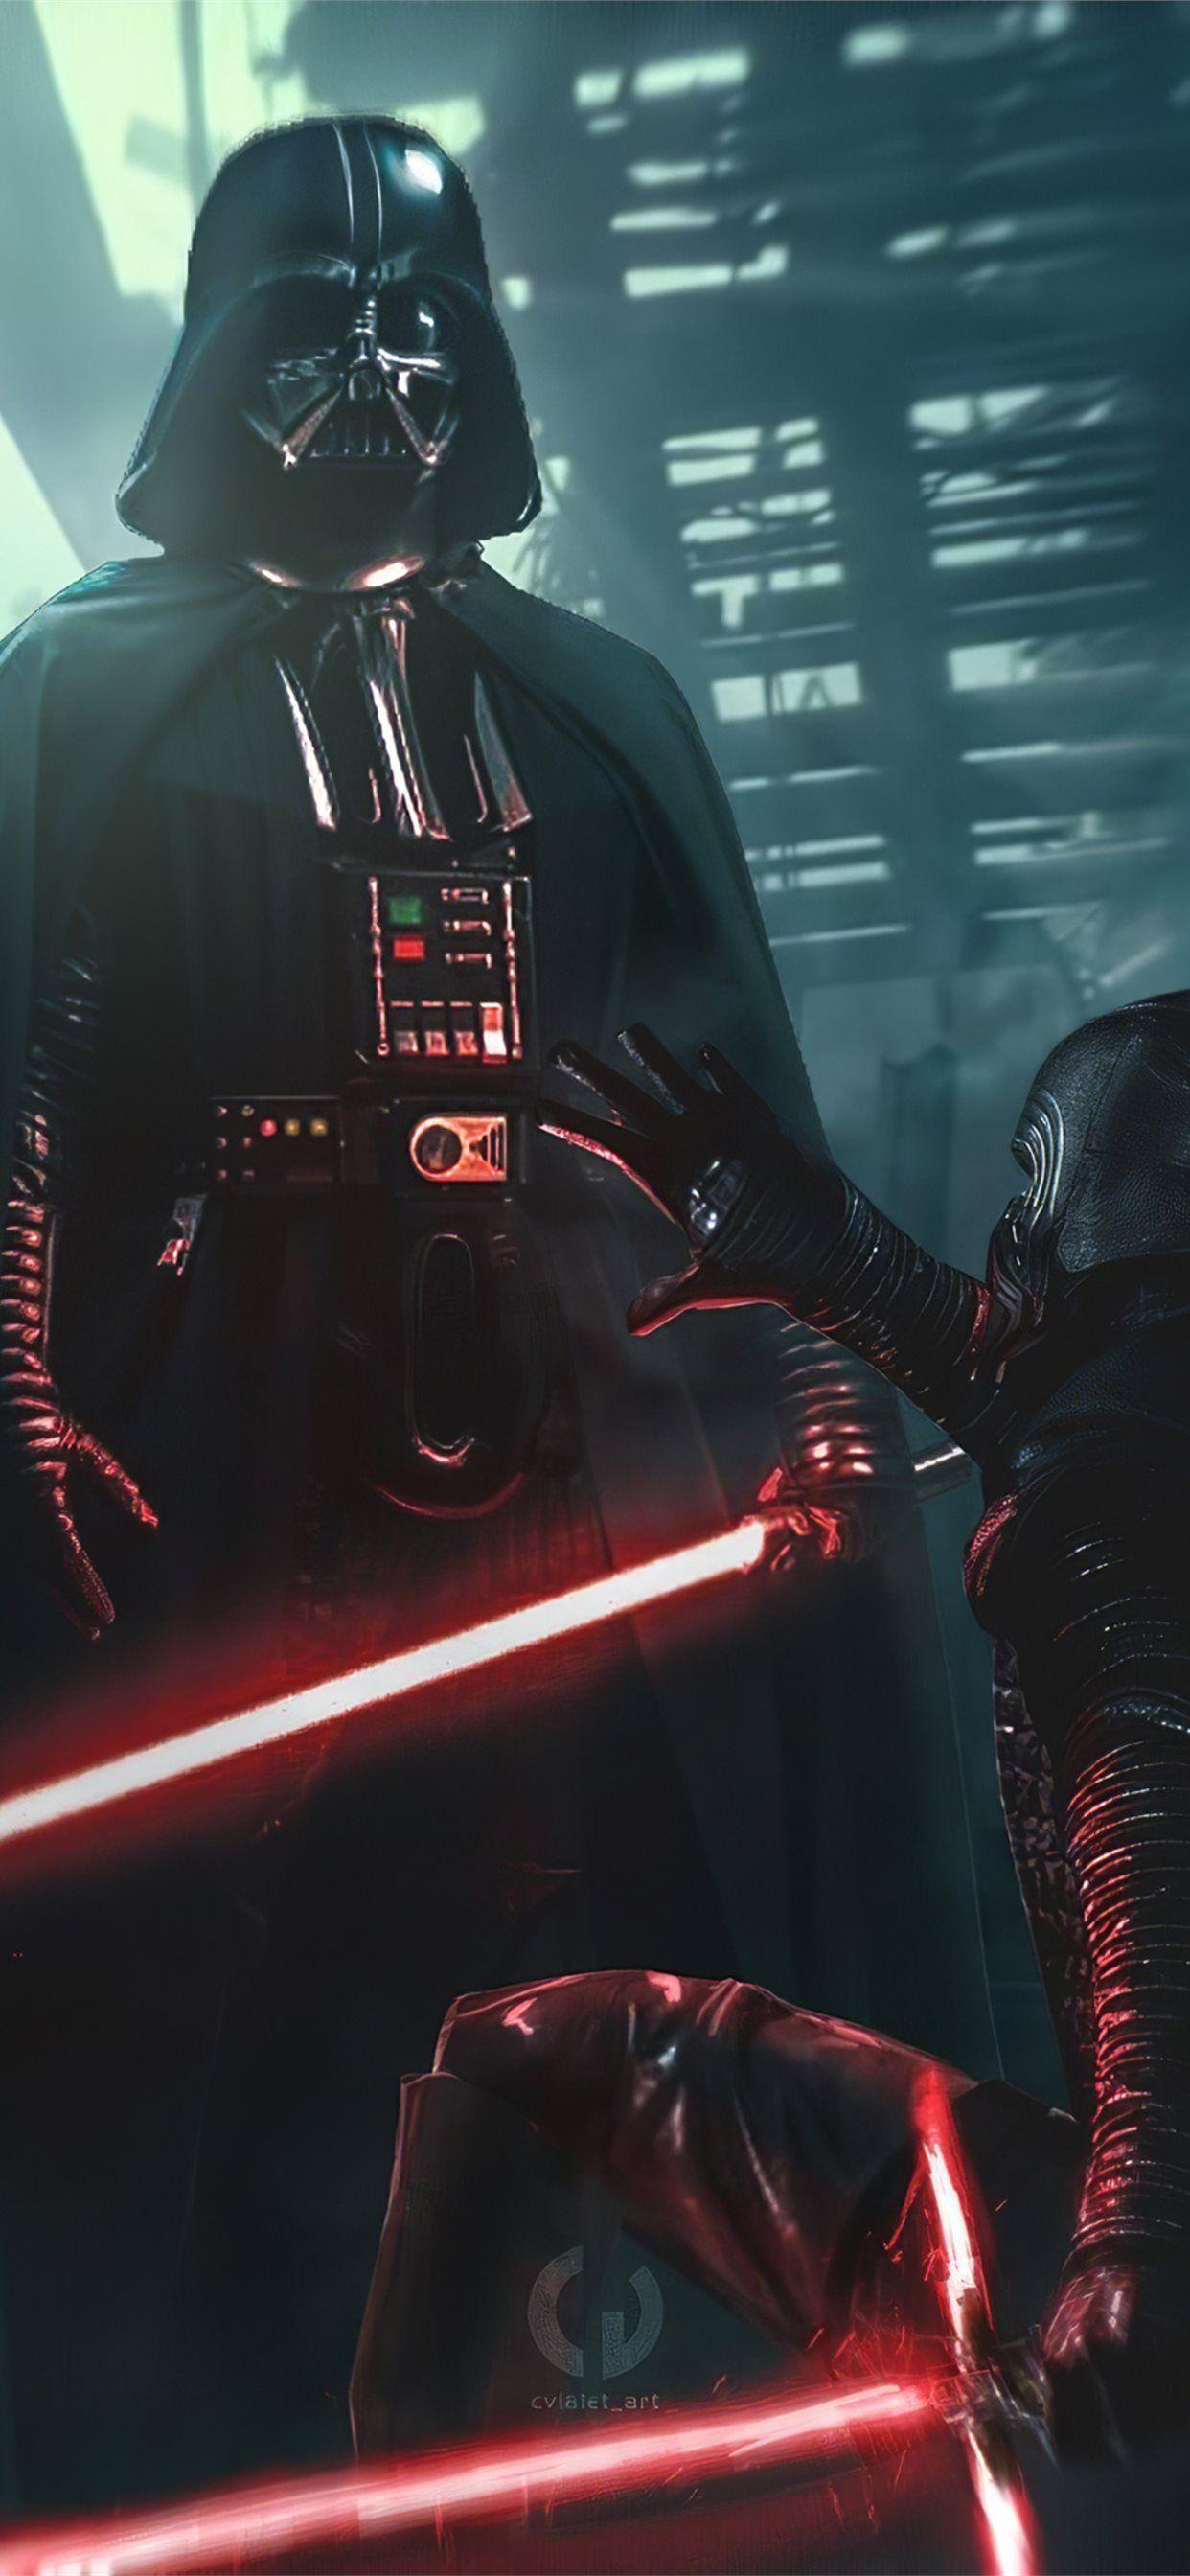 Darth Vader Iphone X Wallpapers Top Free Darth Vader Iphone X Backgrounds Wallpaperaccess